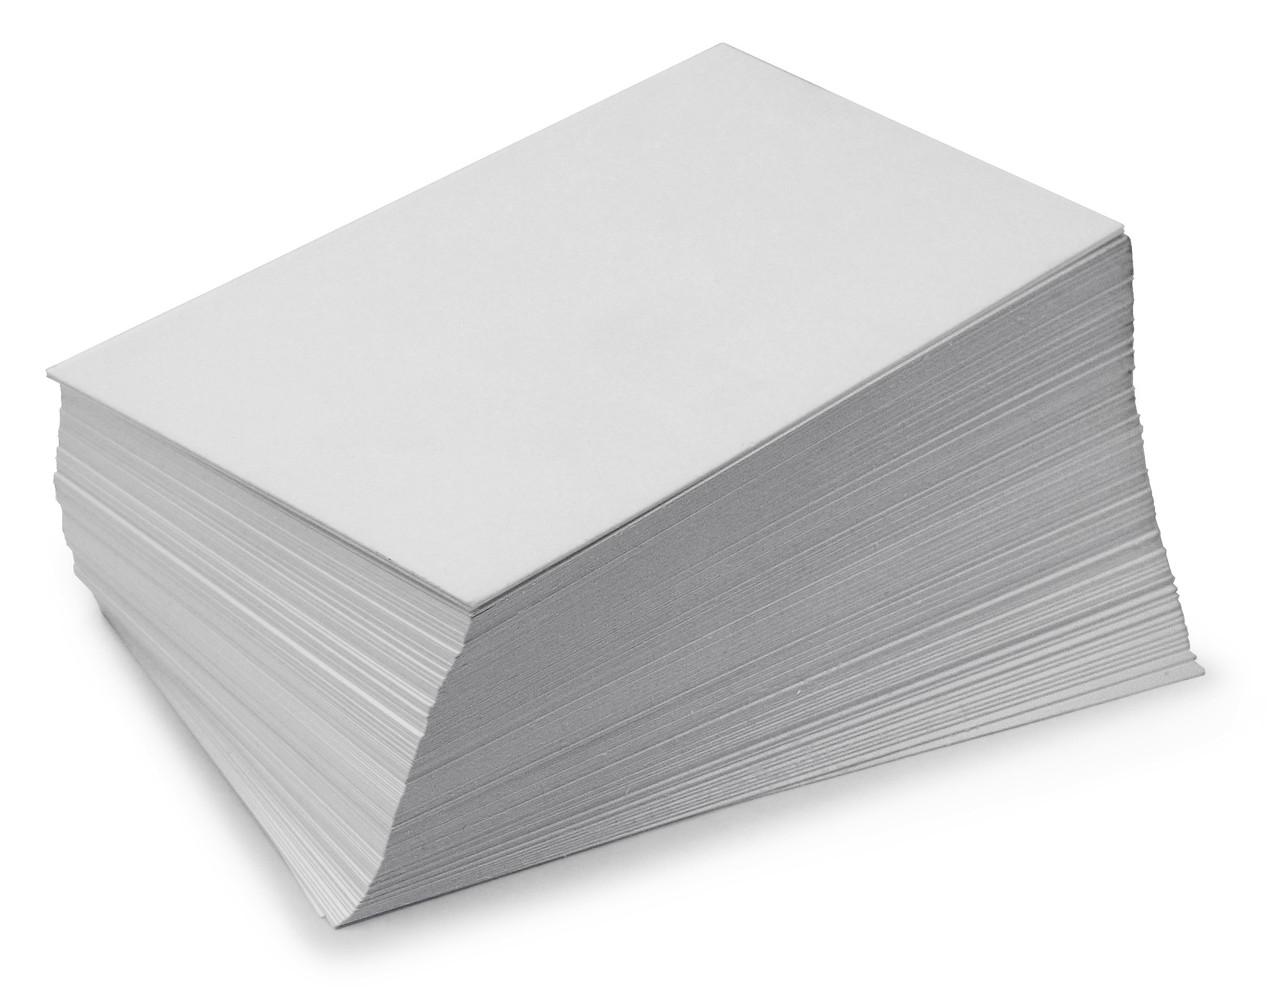 047326 Бумага белая 80гр. 1 лист